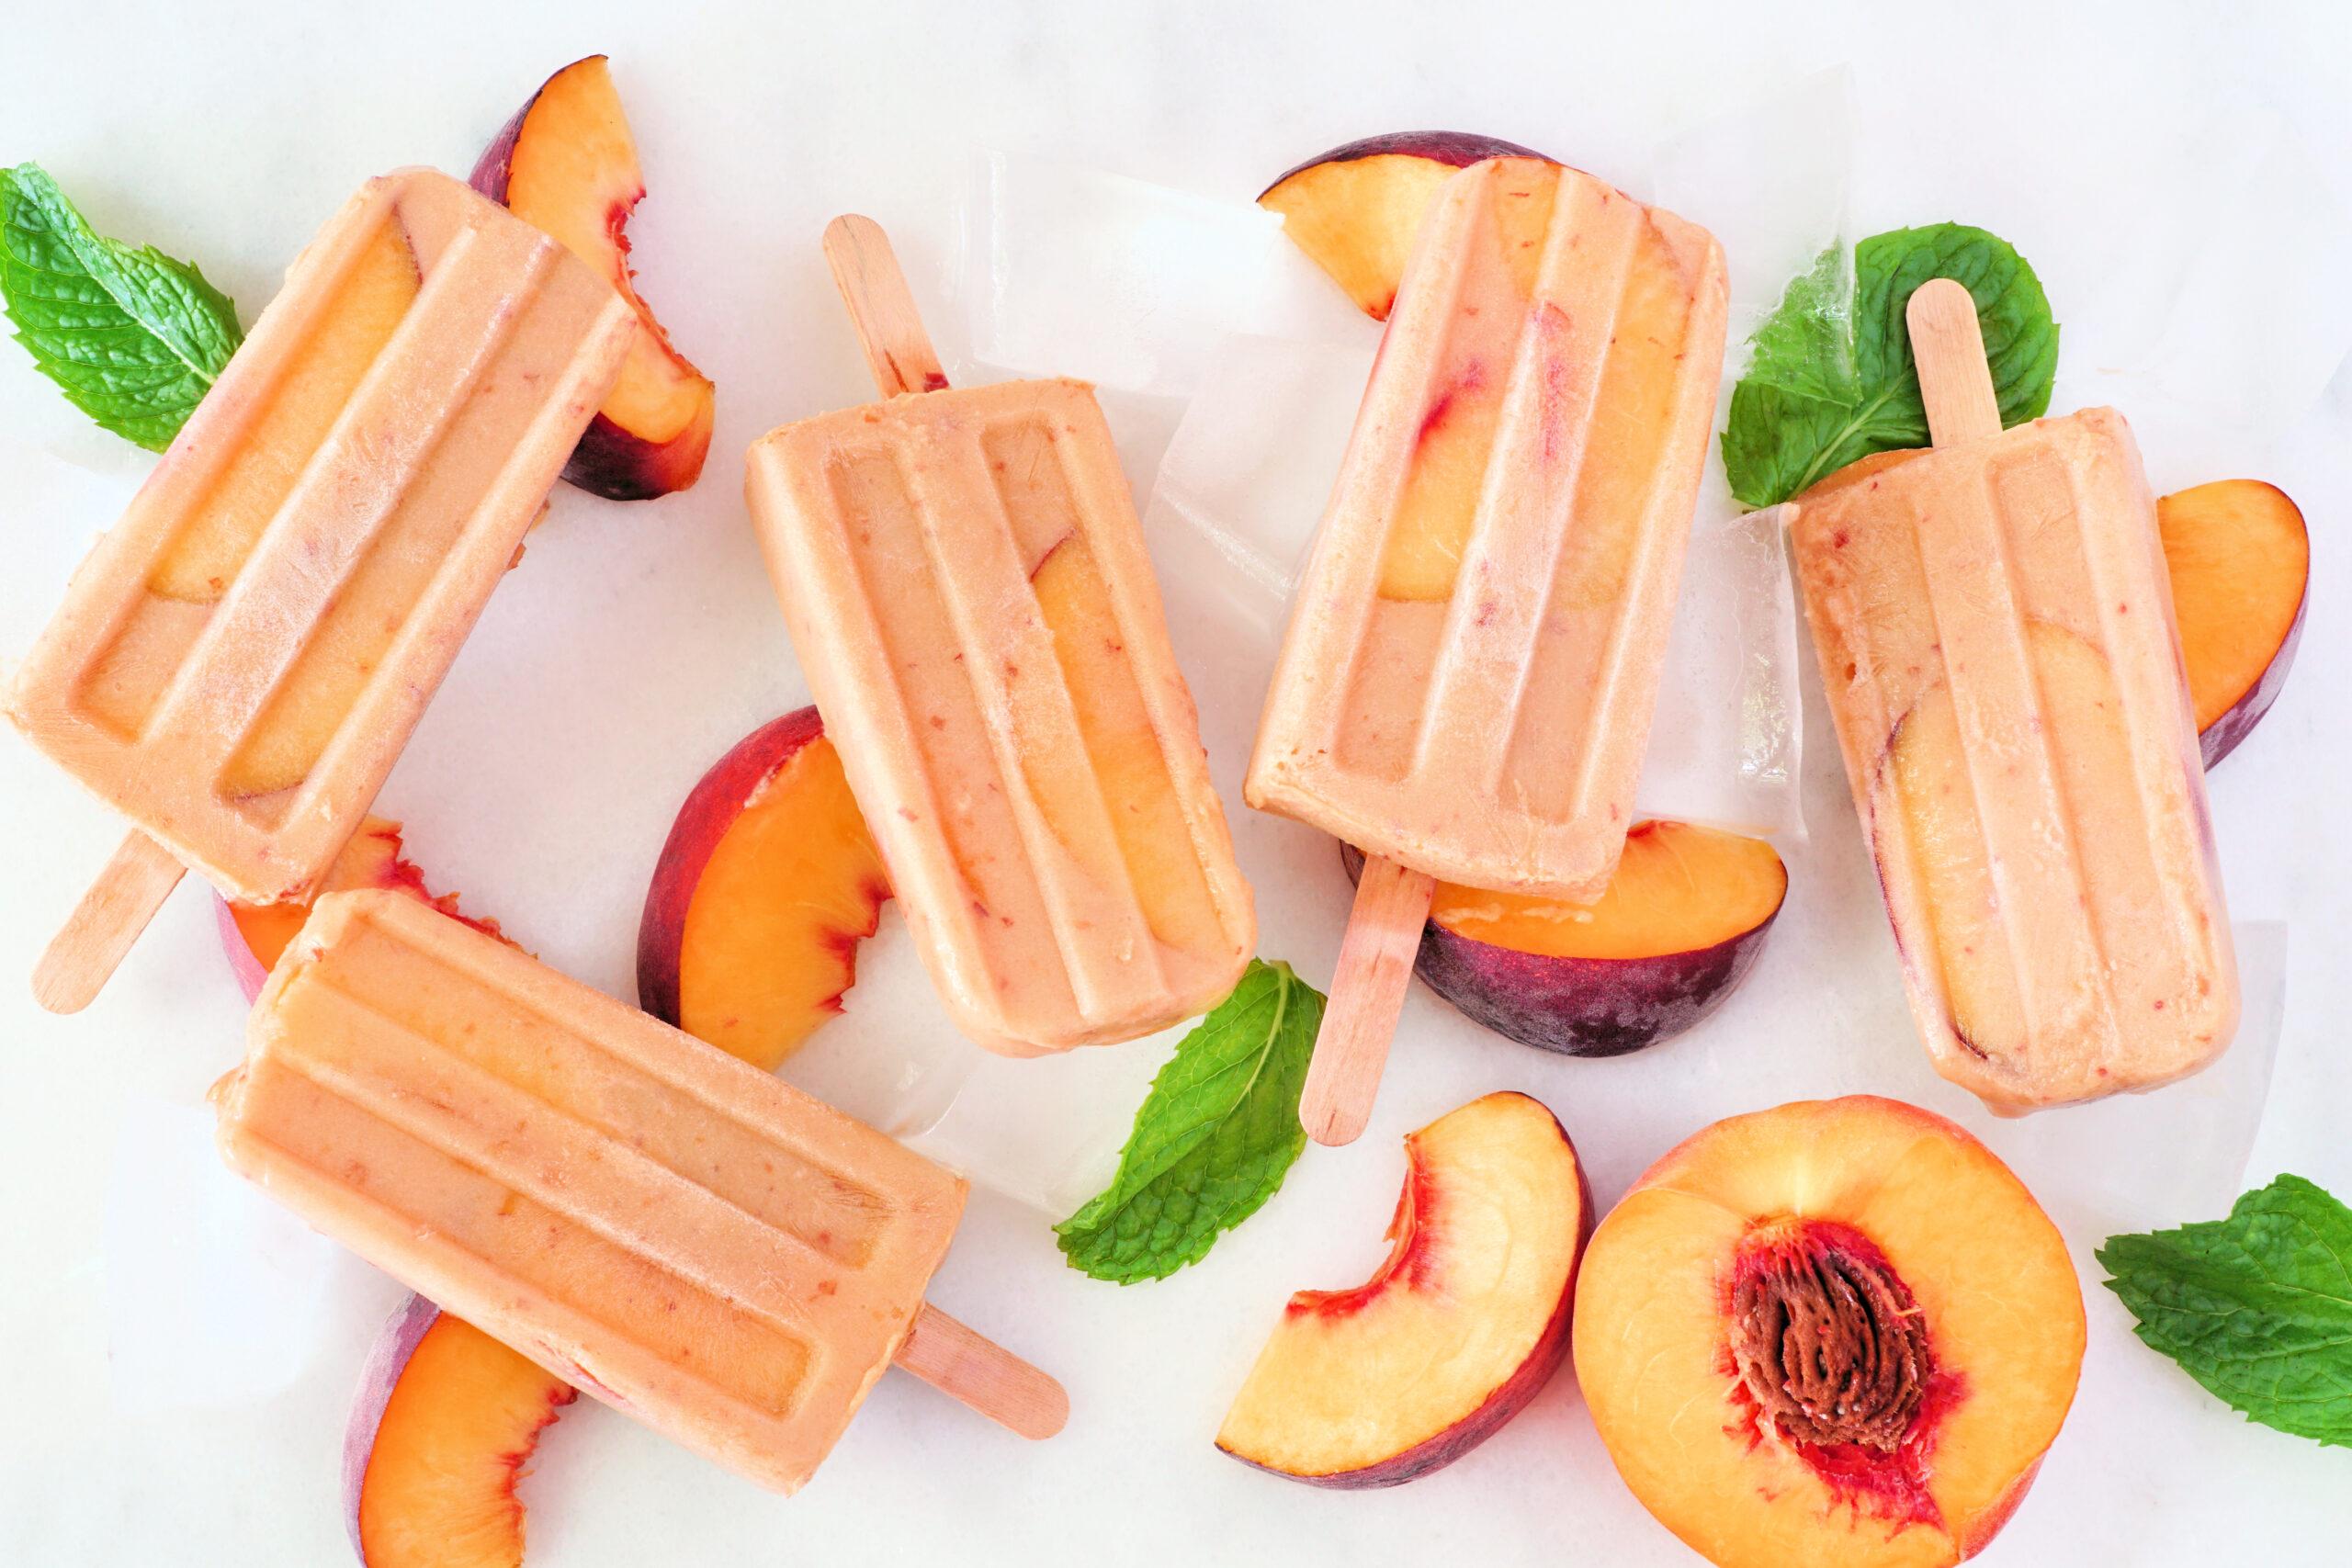 Peaches and cream ice pops